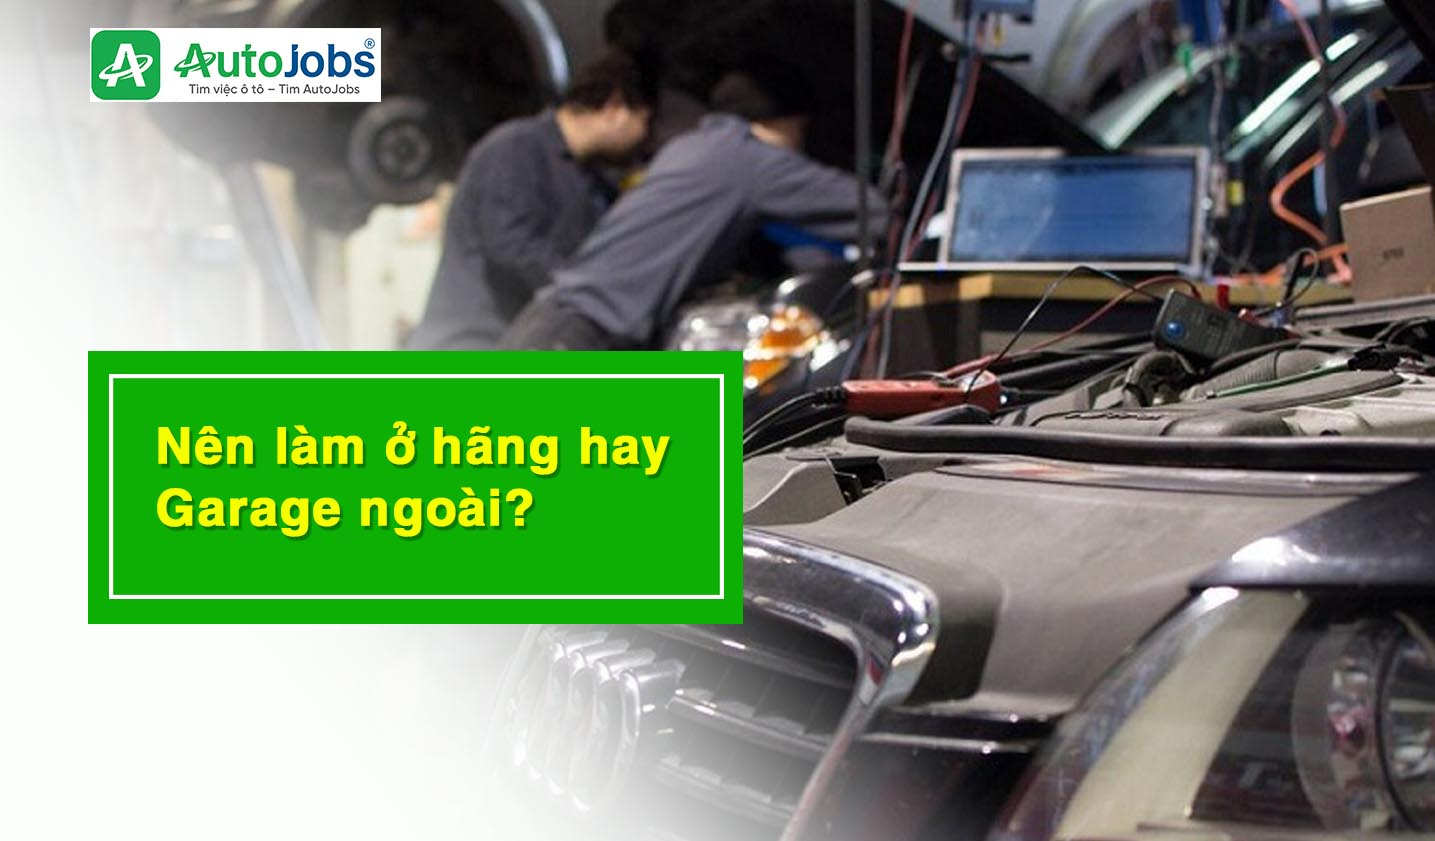 nen-chon-hang-hay-garage-ngoai.jpg